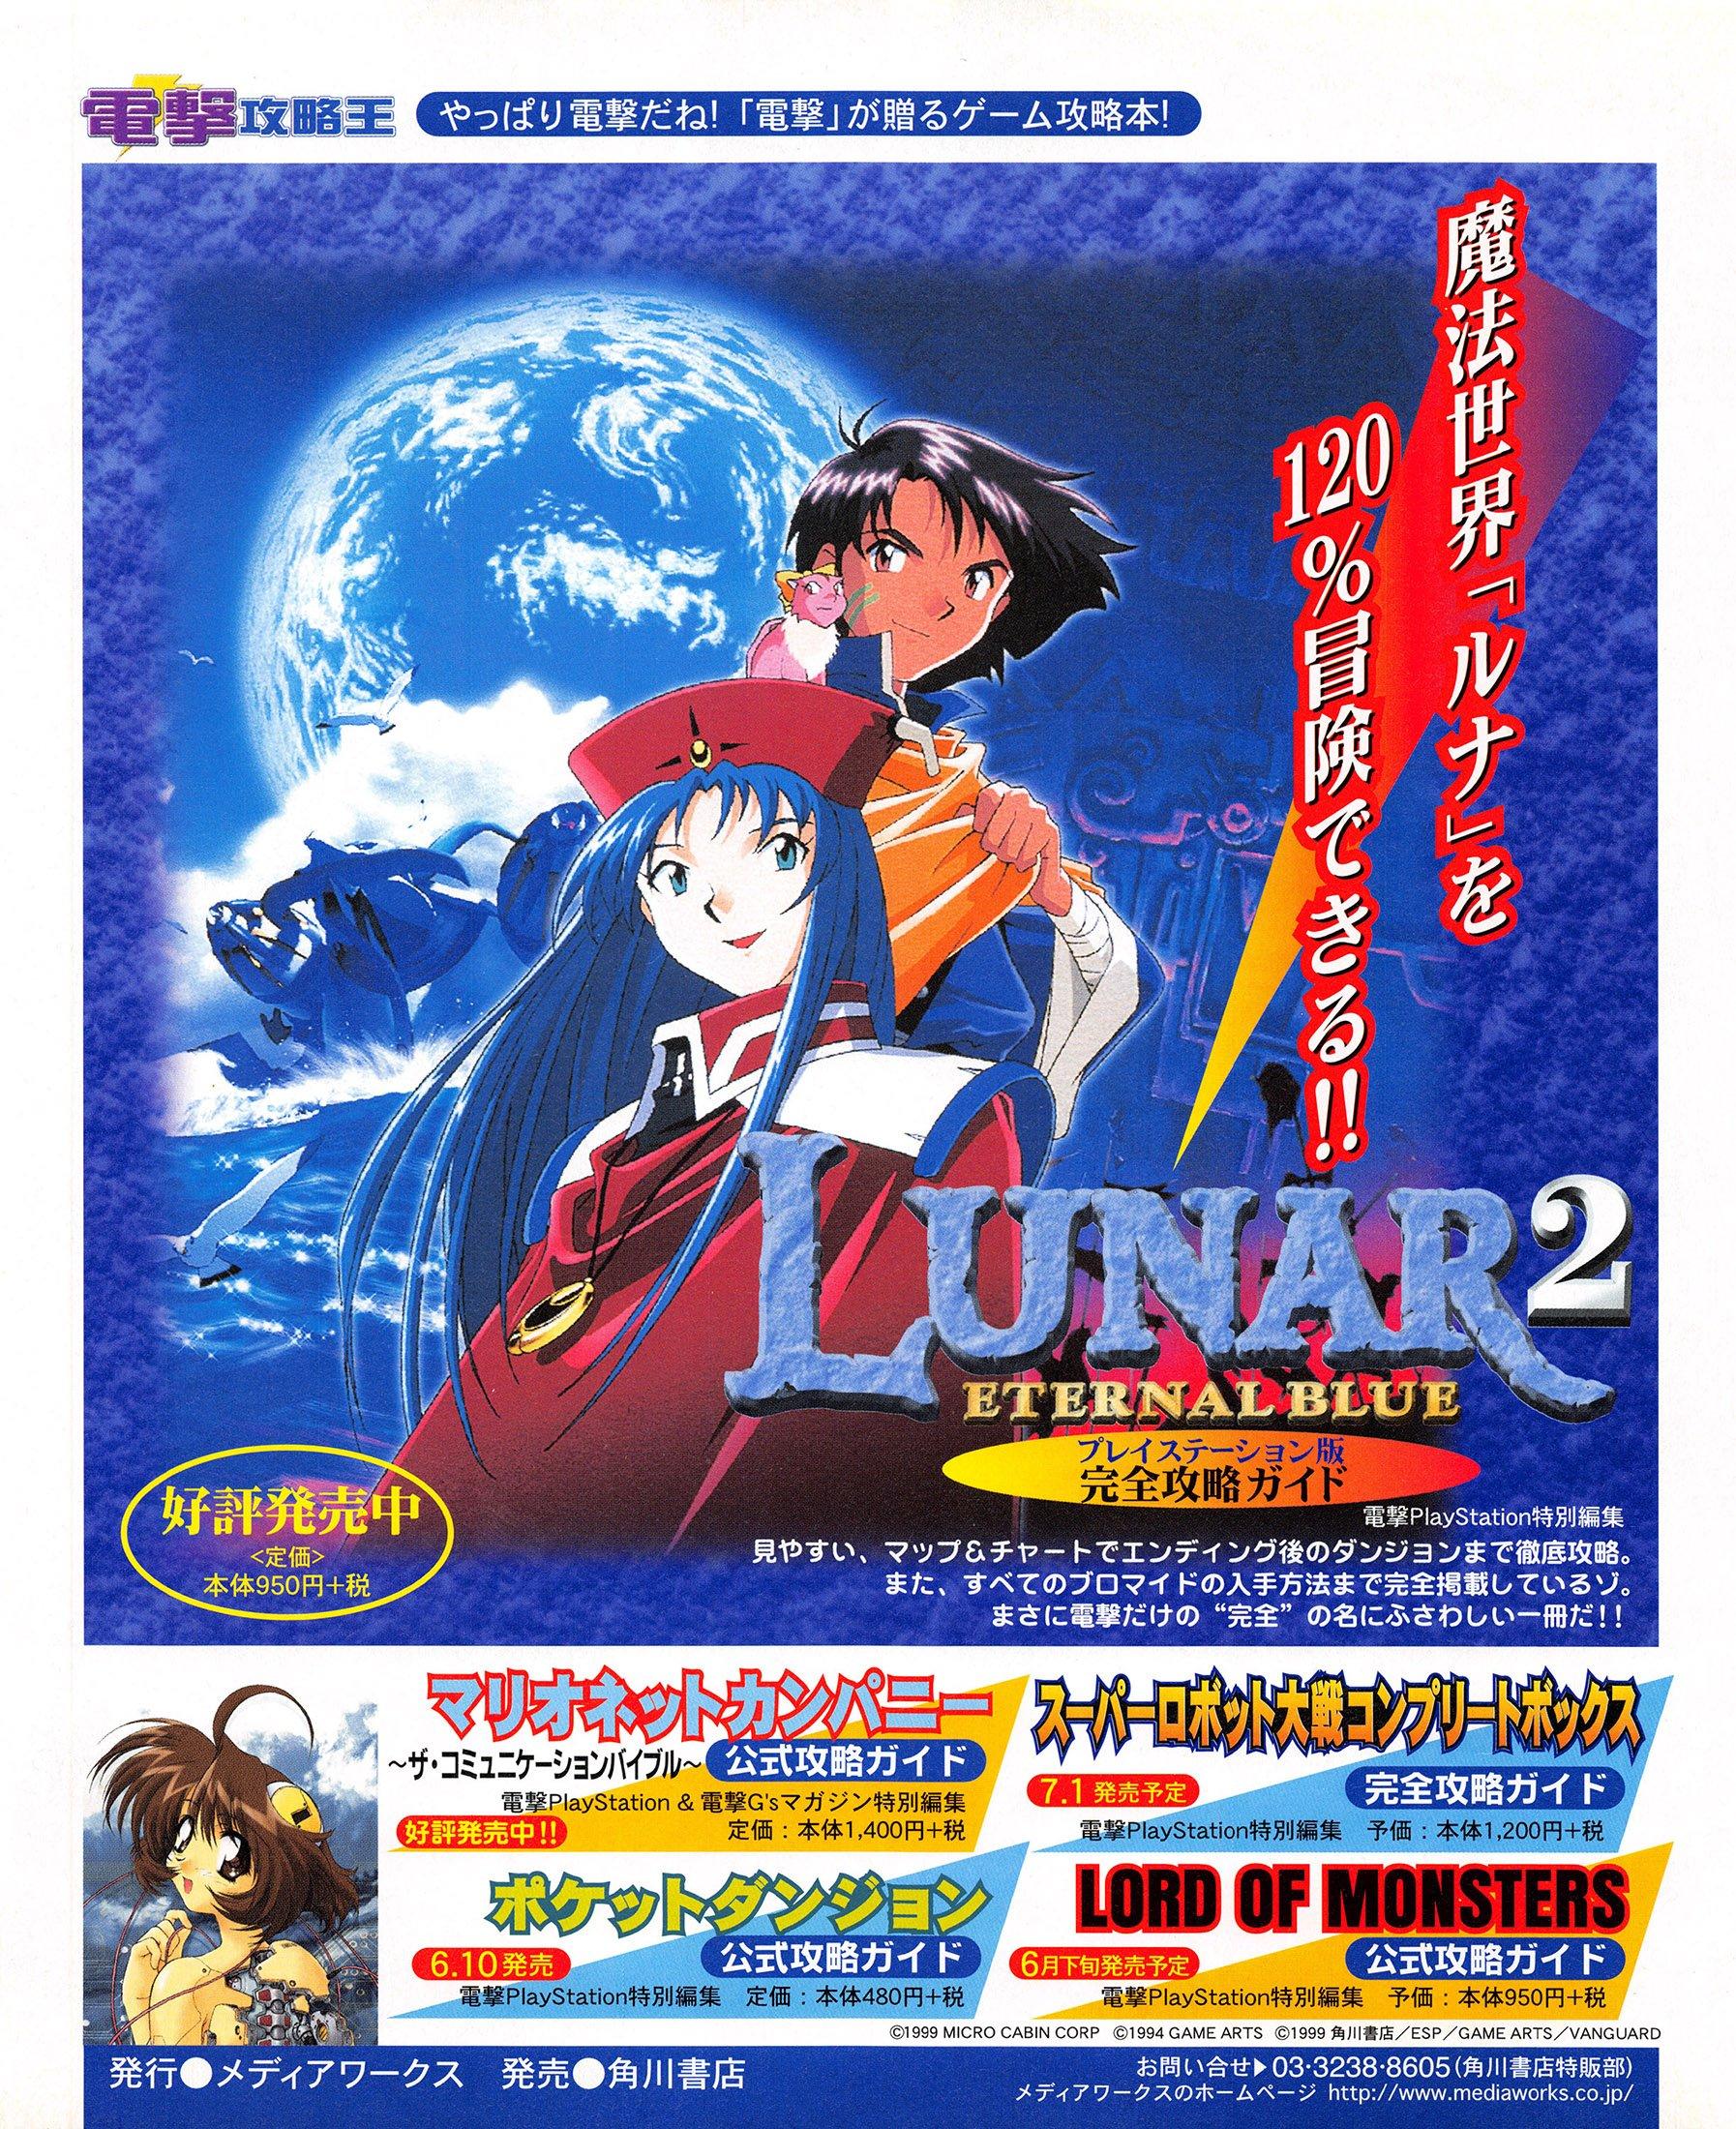 Lunar 2: Eternal Blue - Complete Strategy Guide